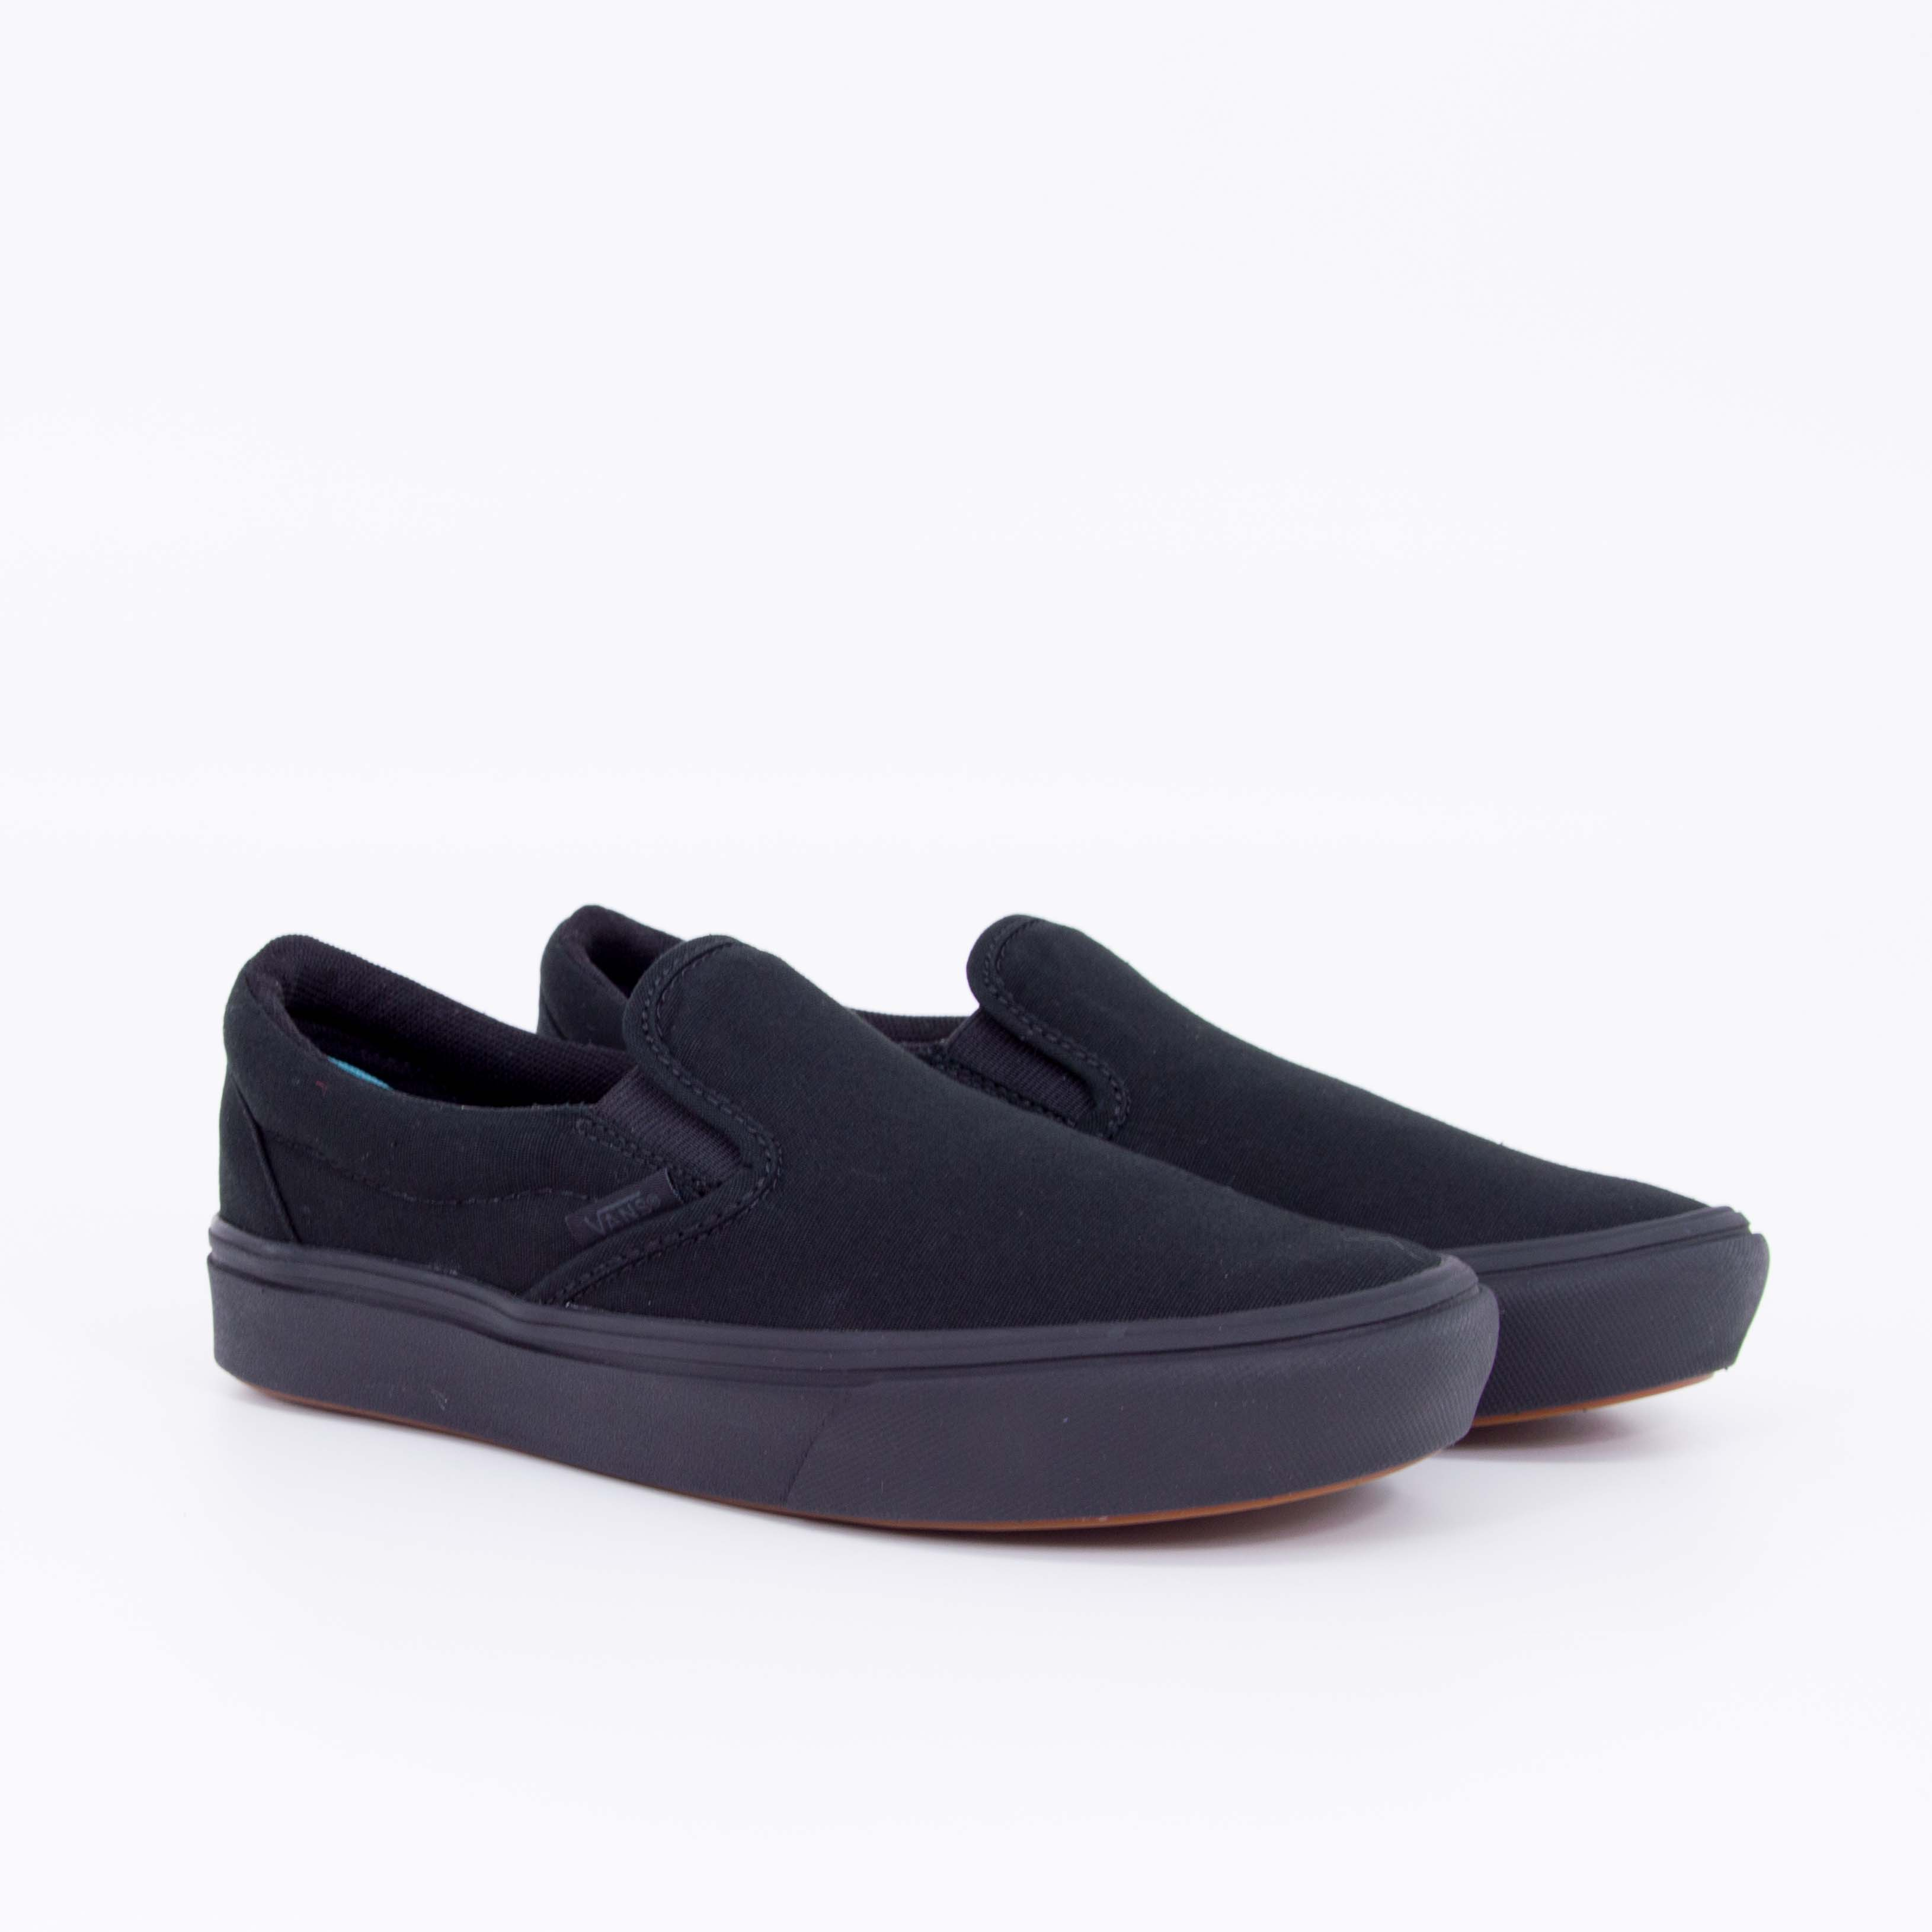 Vans - COMFYCUSH SLIP-ON - Black/Black